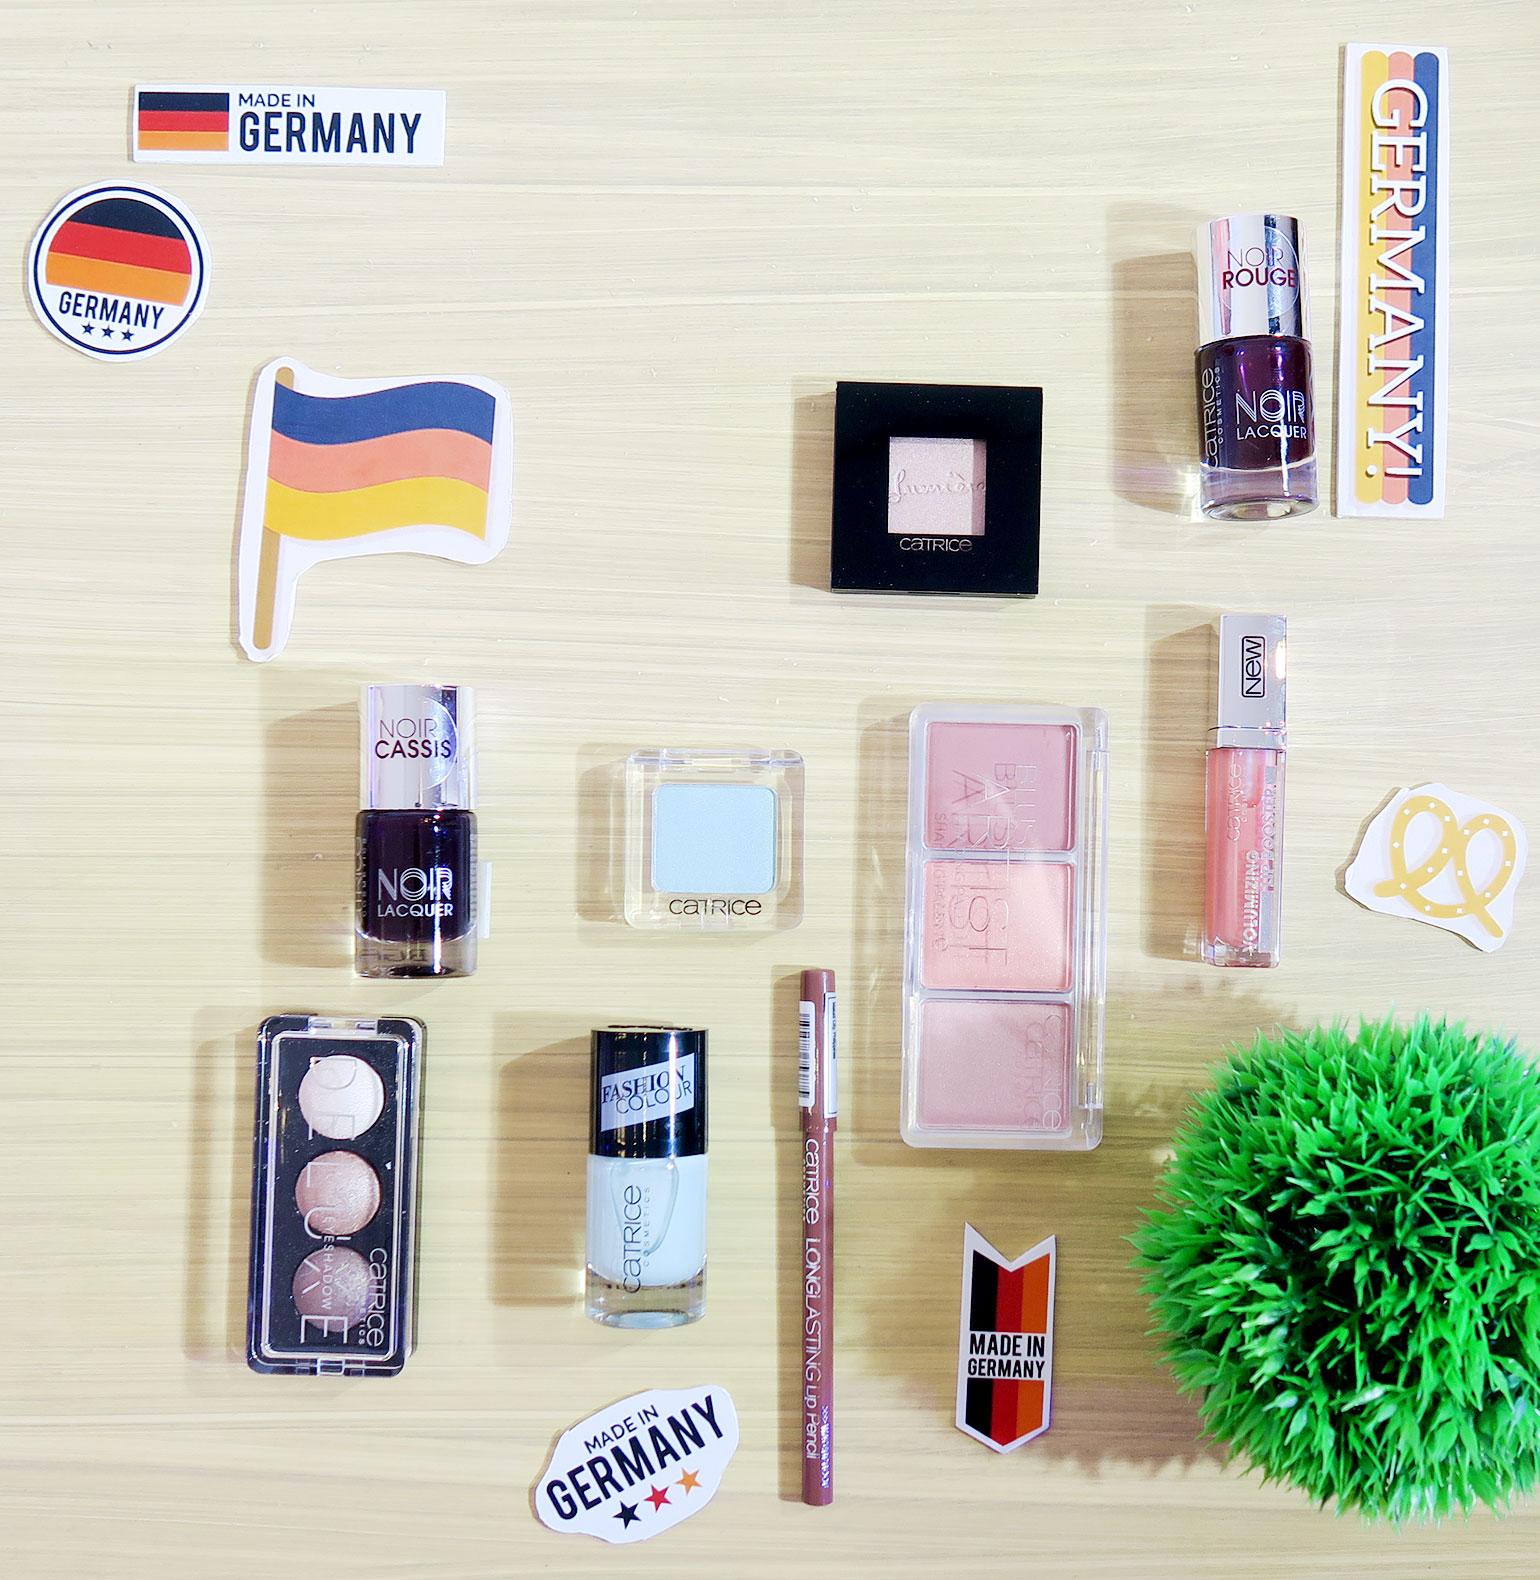 2.1 Catrice Cosmetics Distributed by Bhagi's International Trading Corporation - Gen-zel.com (c)